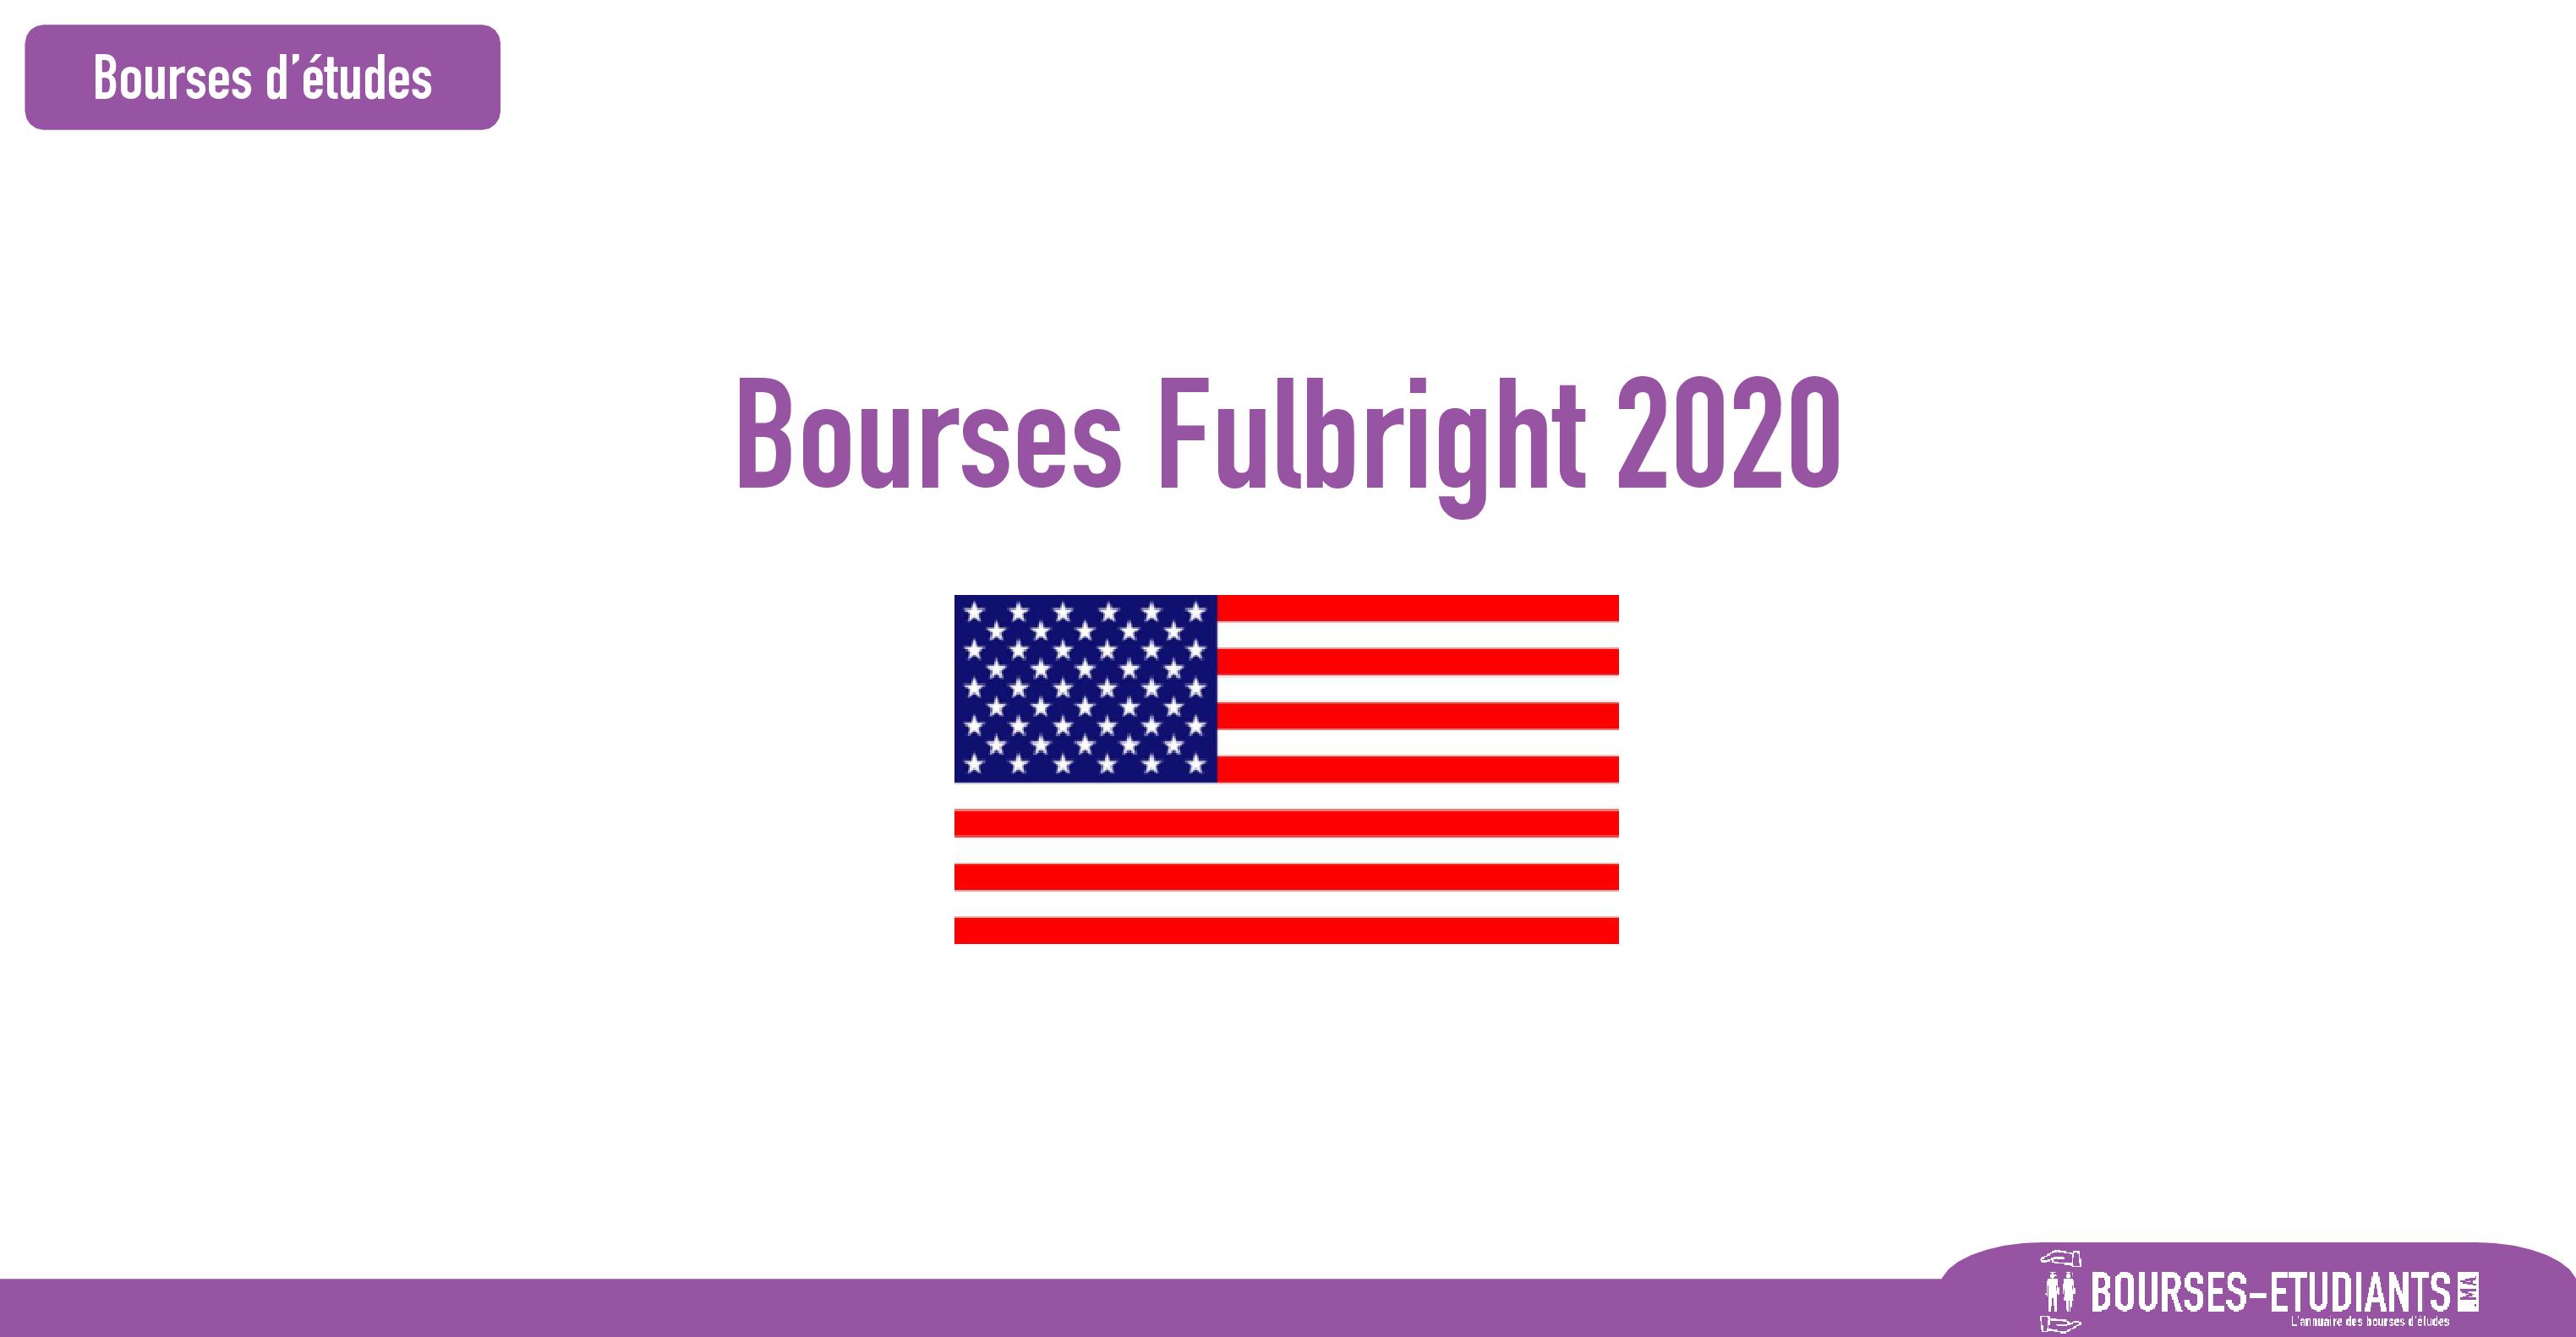 Bourses de recherche Etat-Unis 2020 : Fulbright African ...